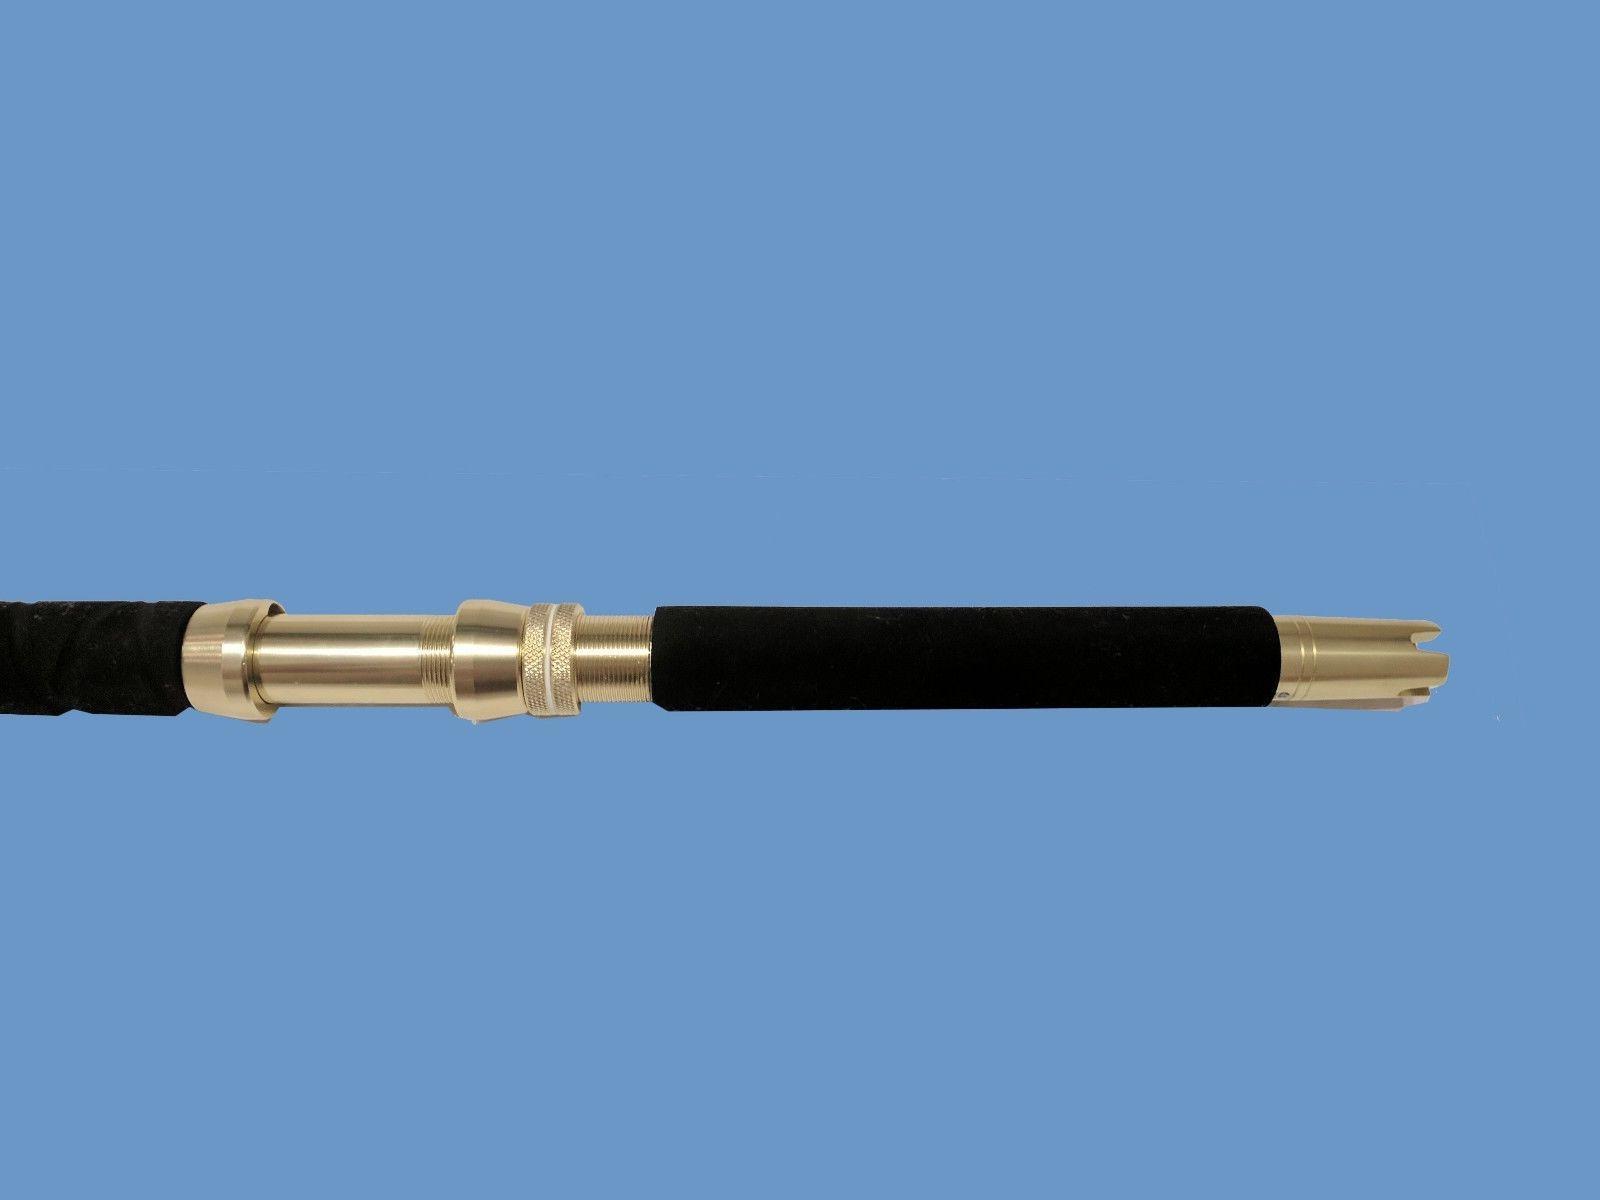 20-30 Lb Fiberglass Blank Saltwater Fishing Rods Pack